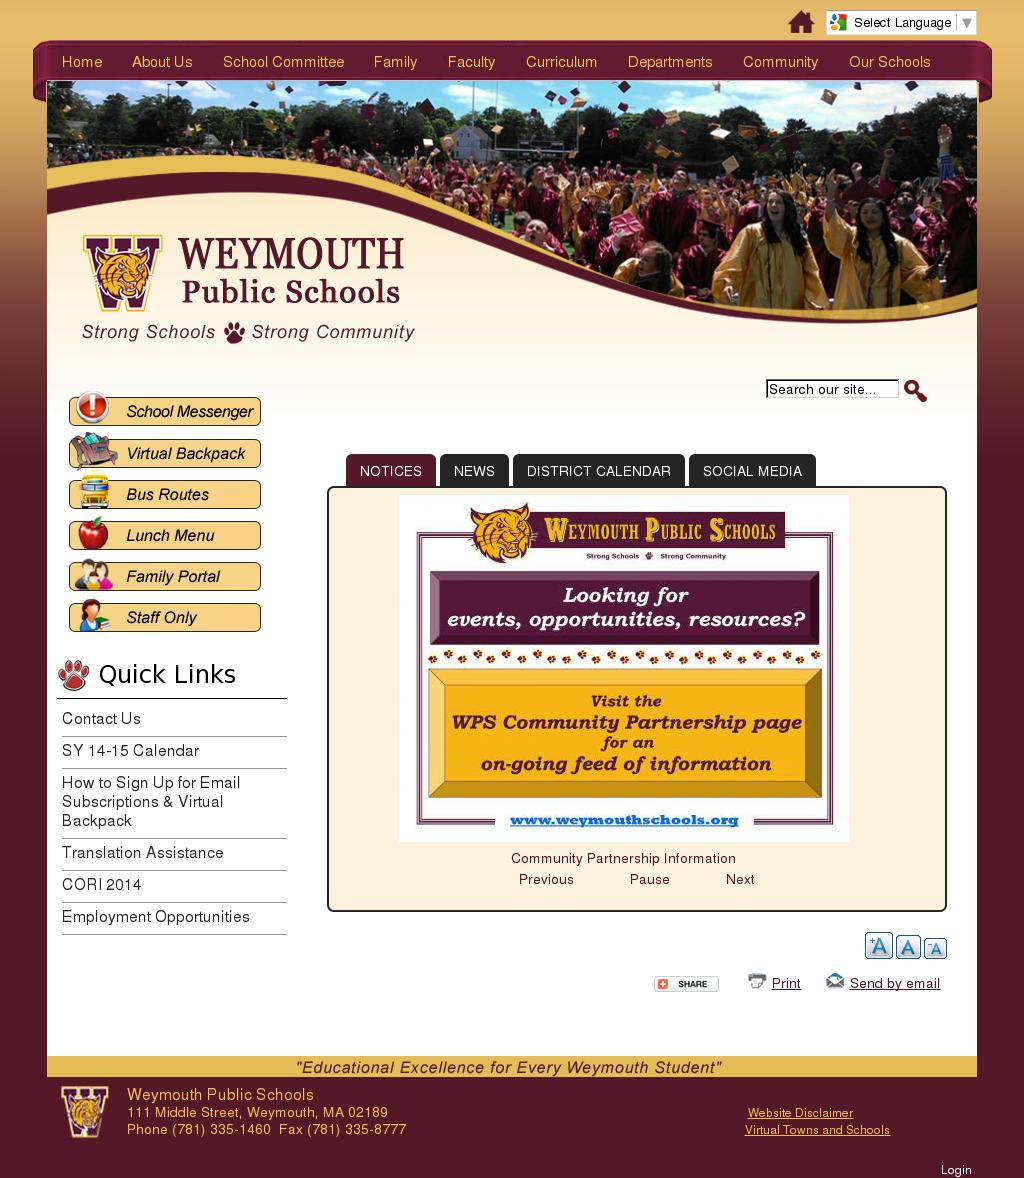 Weymouth Public Schools website history